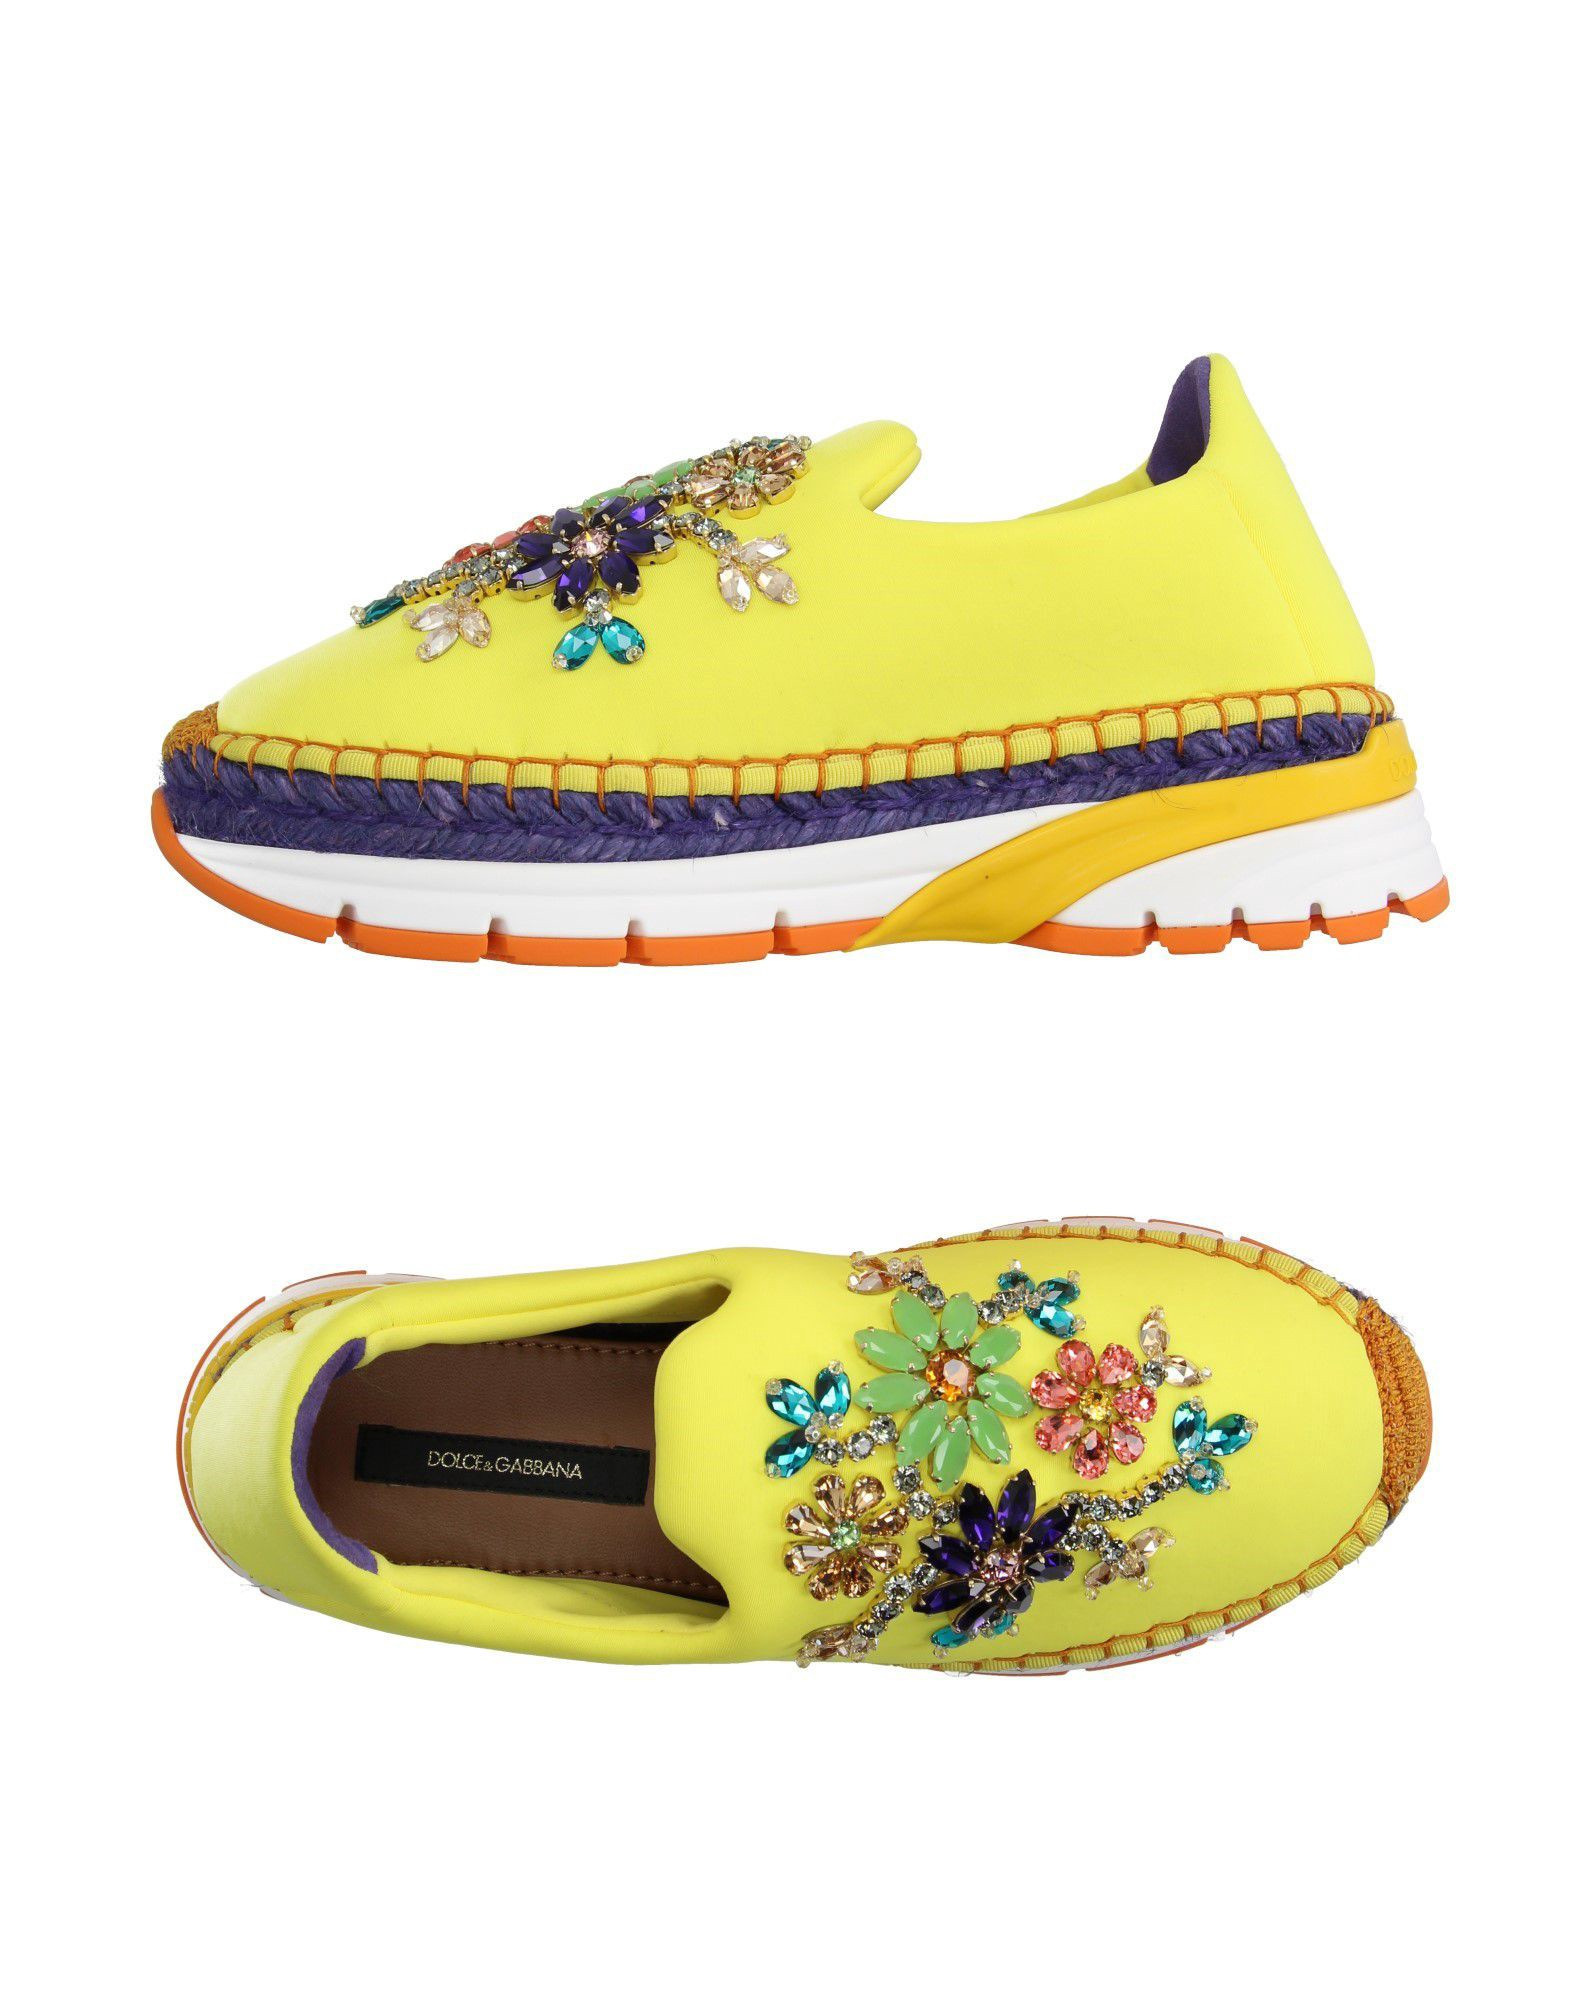 Dolce & Gabbana 运动鞋 In Yellow